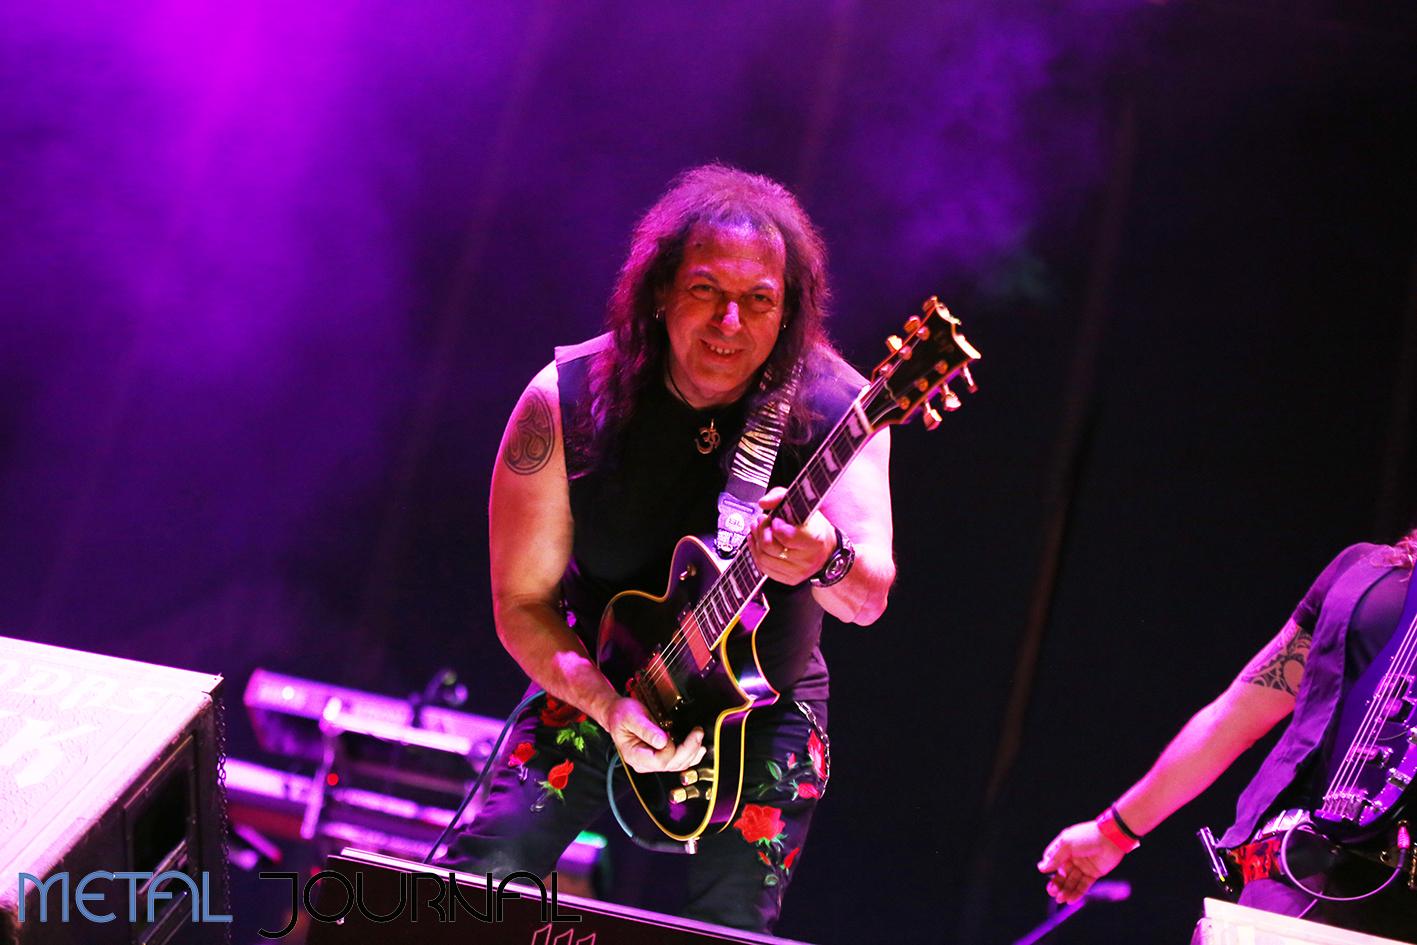 medina azahara - leyendas del rock 2019 metal journal pic 8